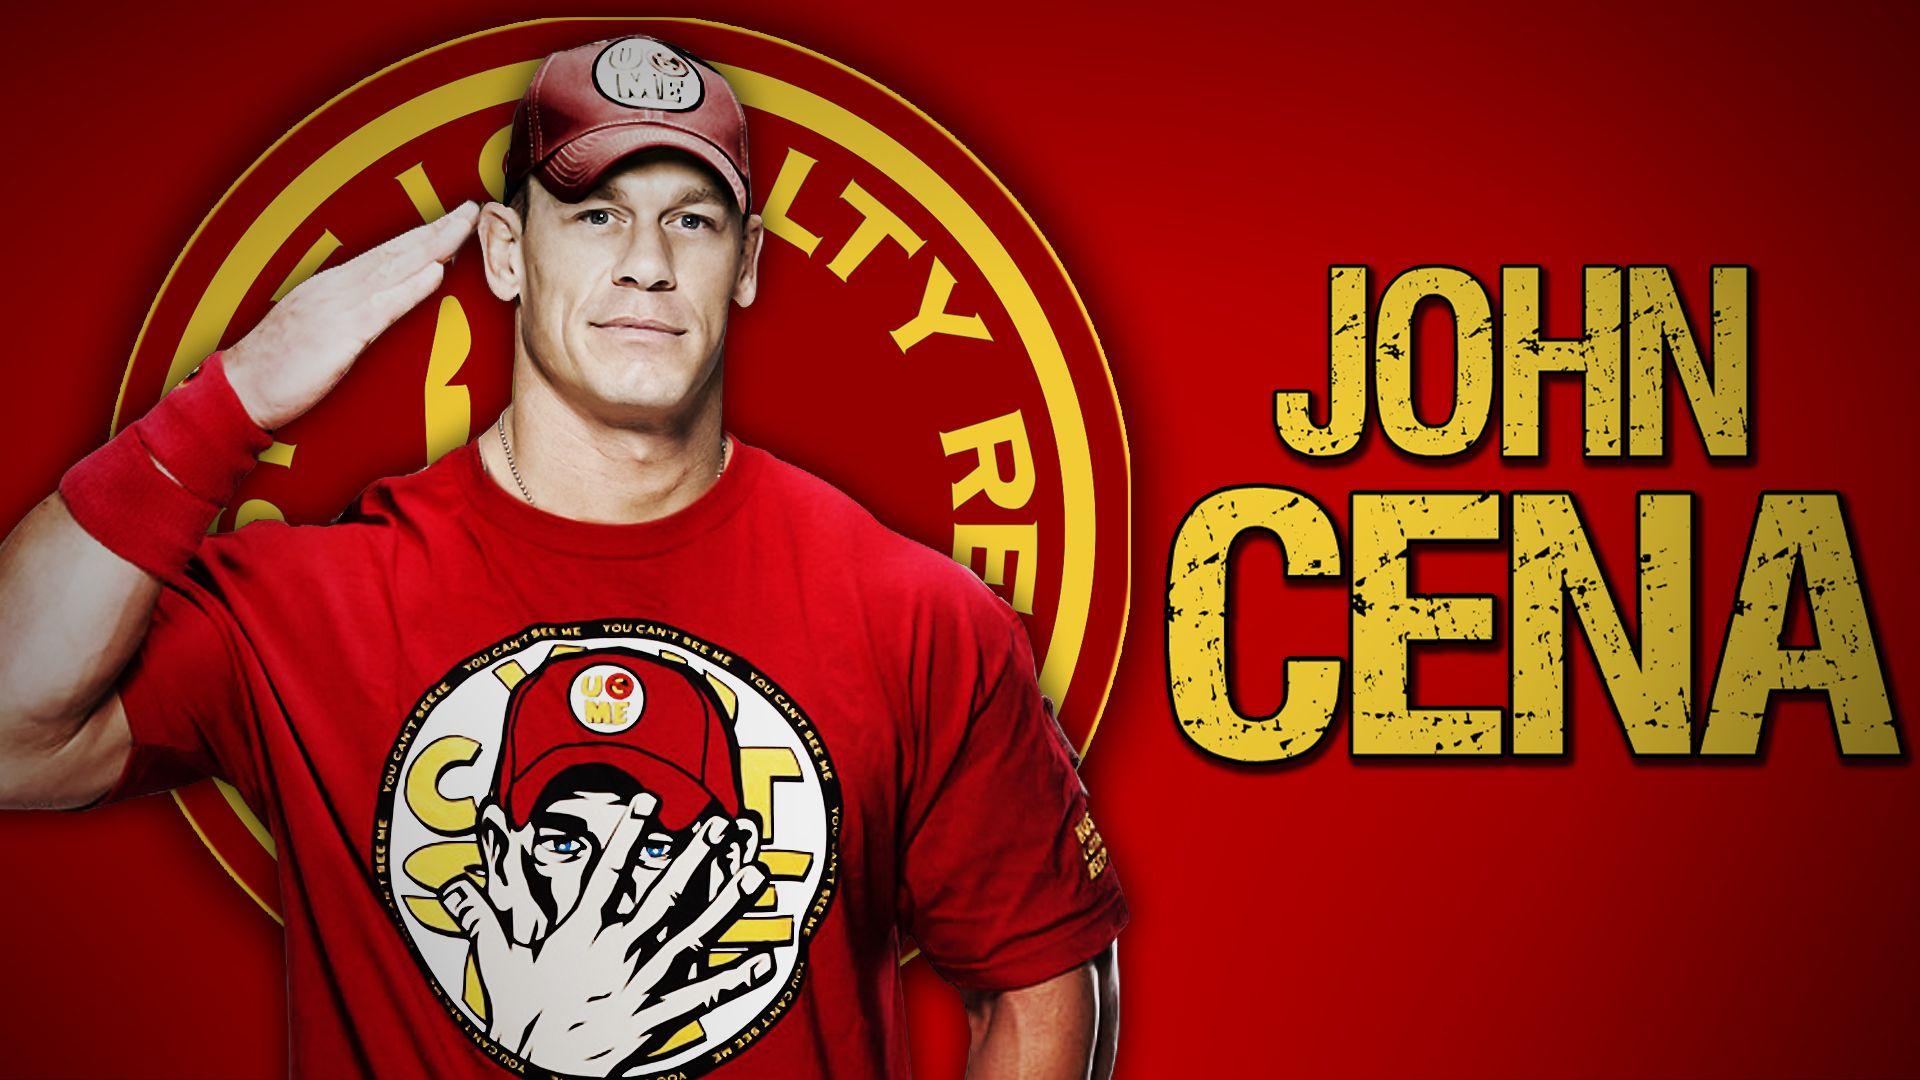 John Cena Hd Wallpaper And Images 2015 Free Download Hd